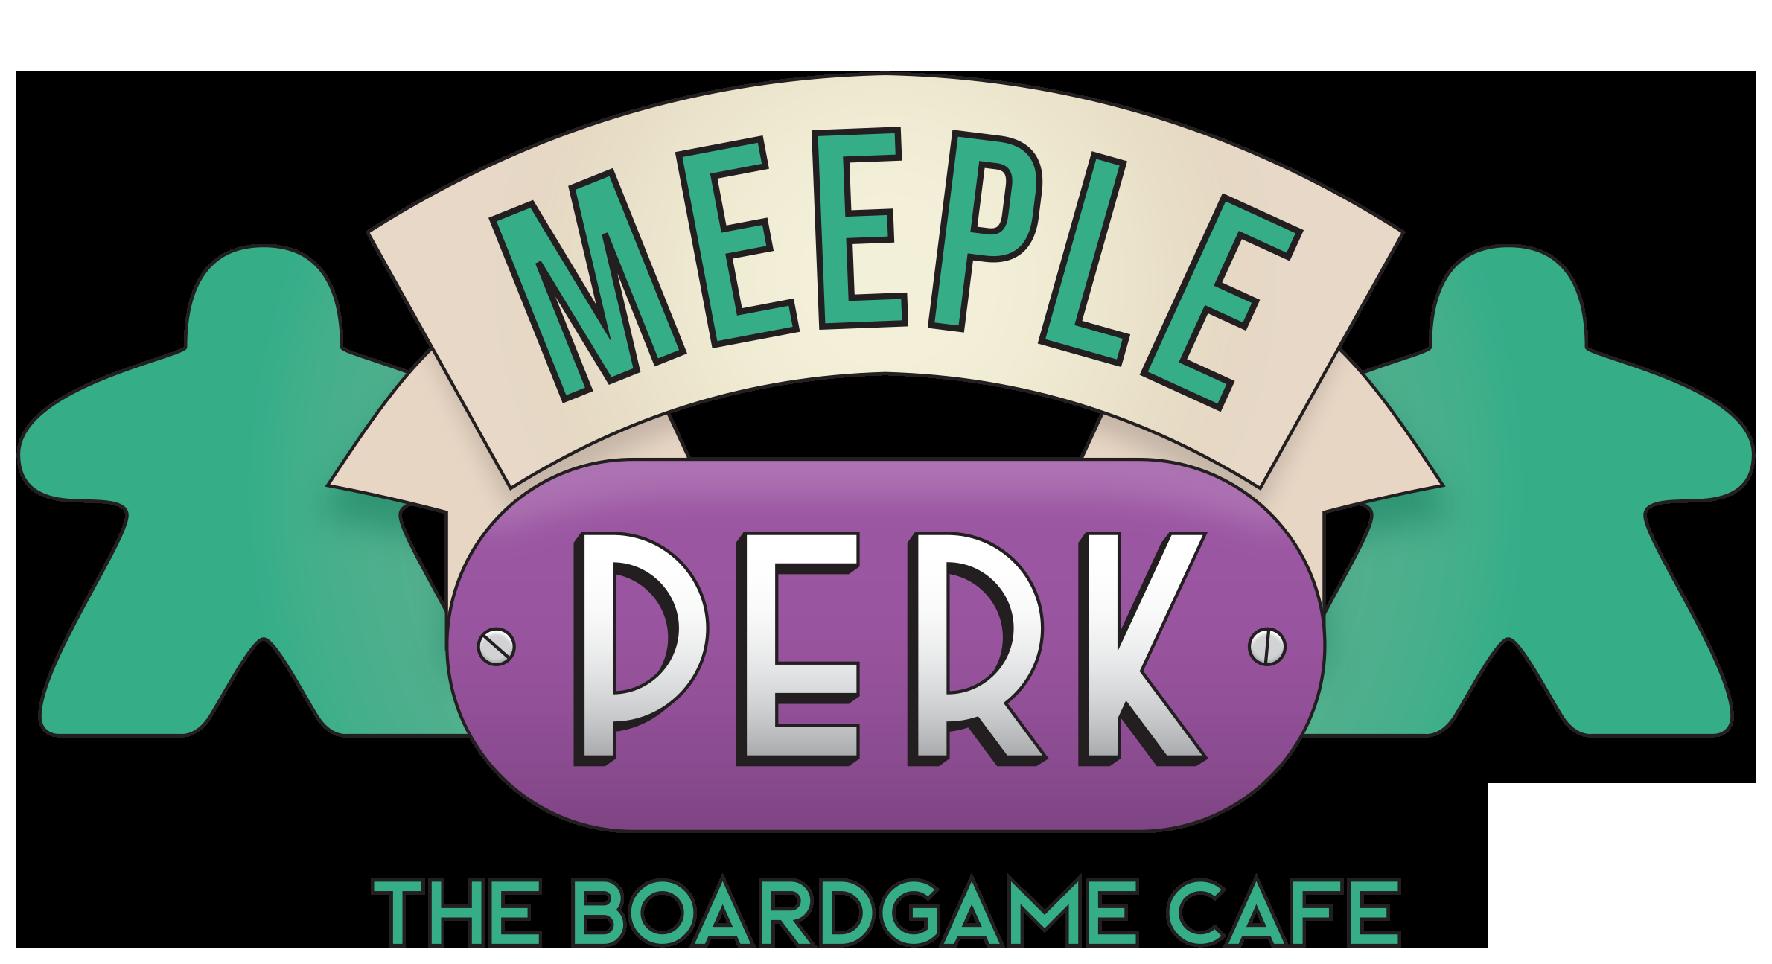 Meeple Perk logo